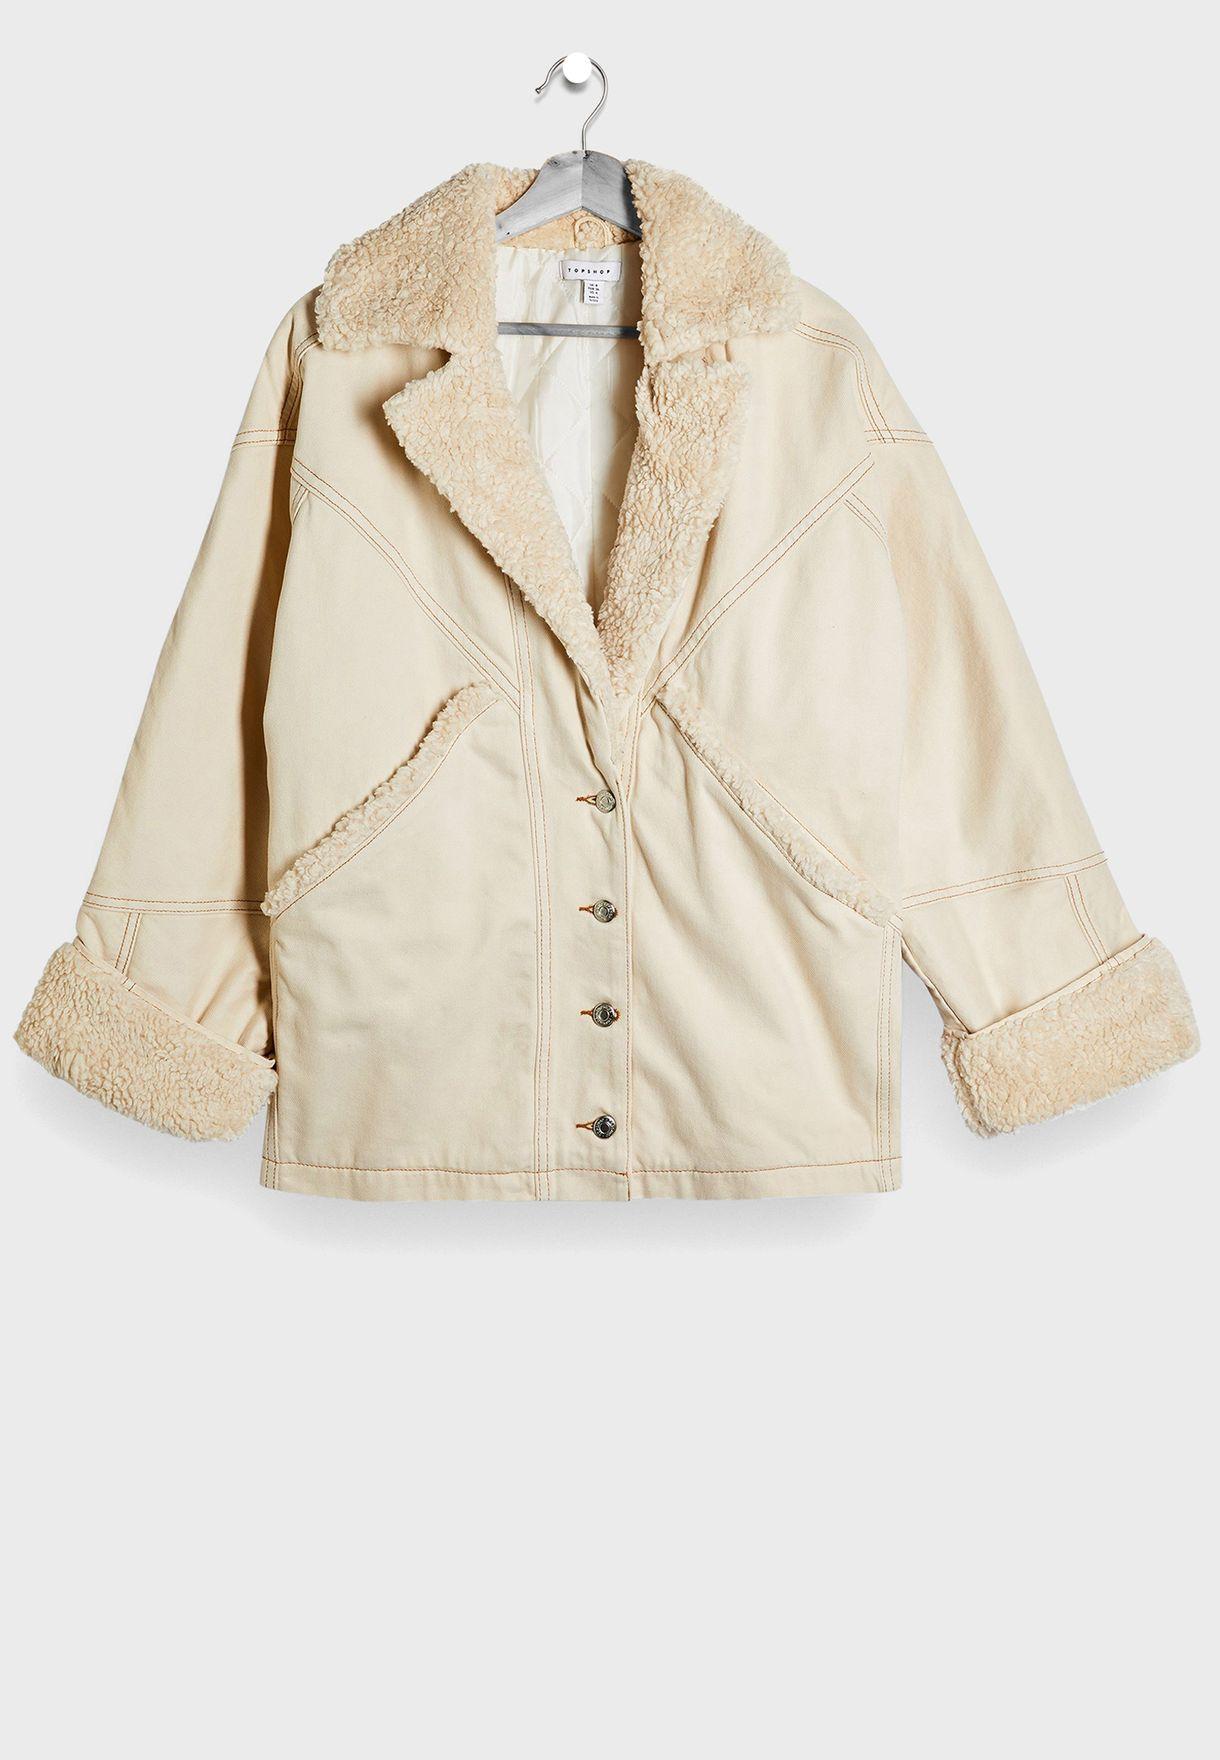 معطف مزين بفرو